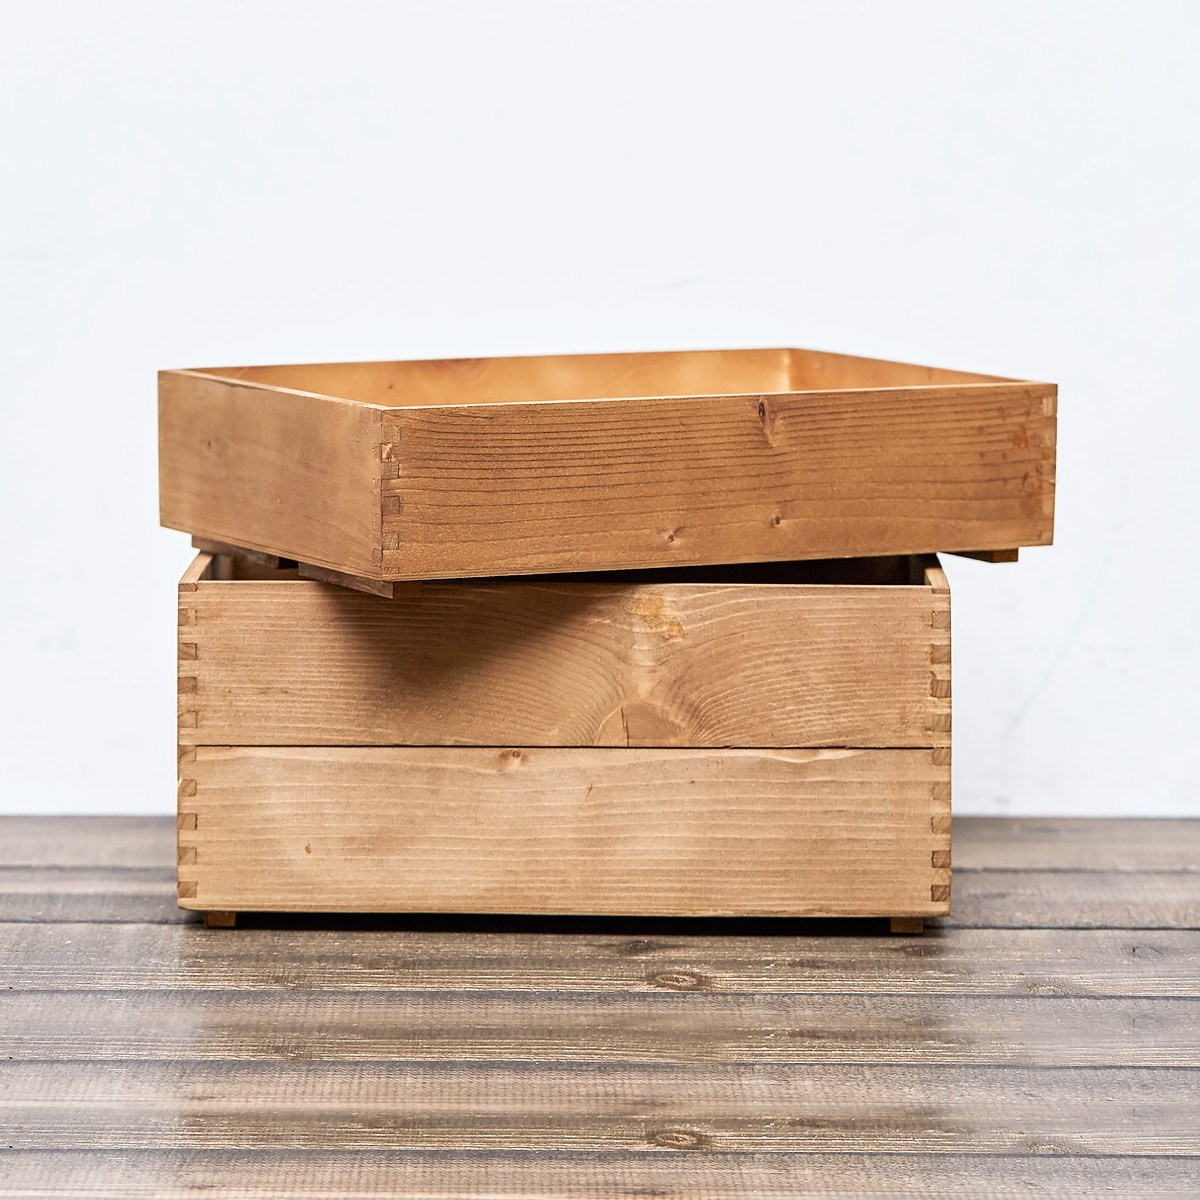 木箱 KIBAKO LL 370x260x168(mm) 1個